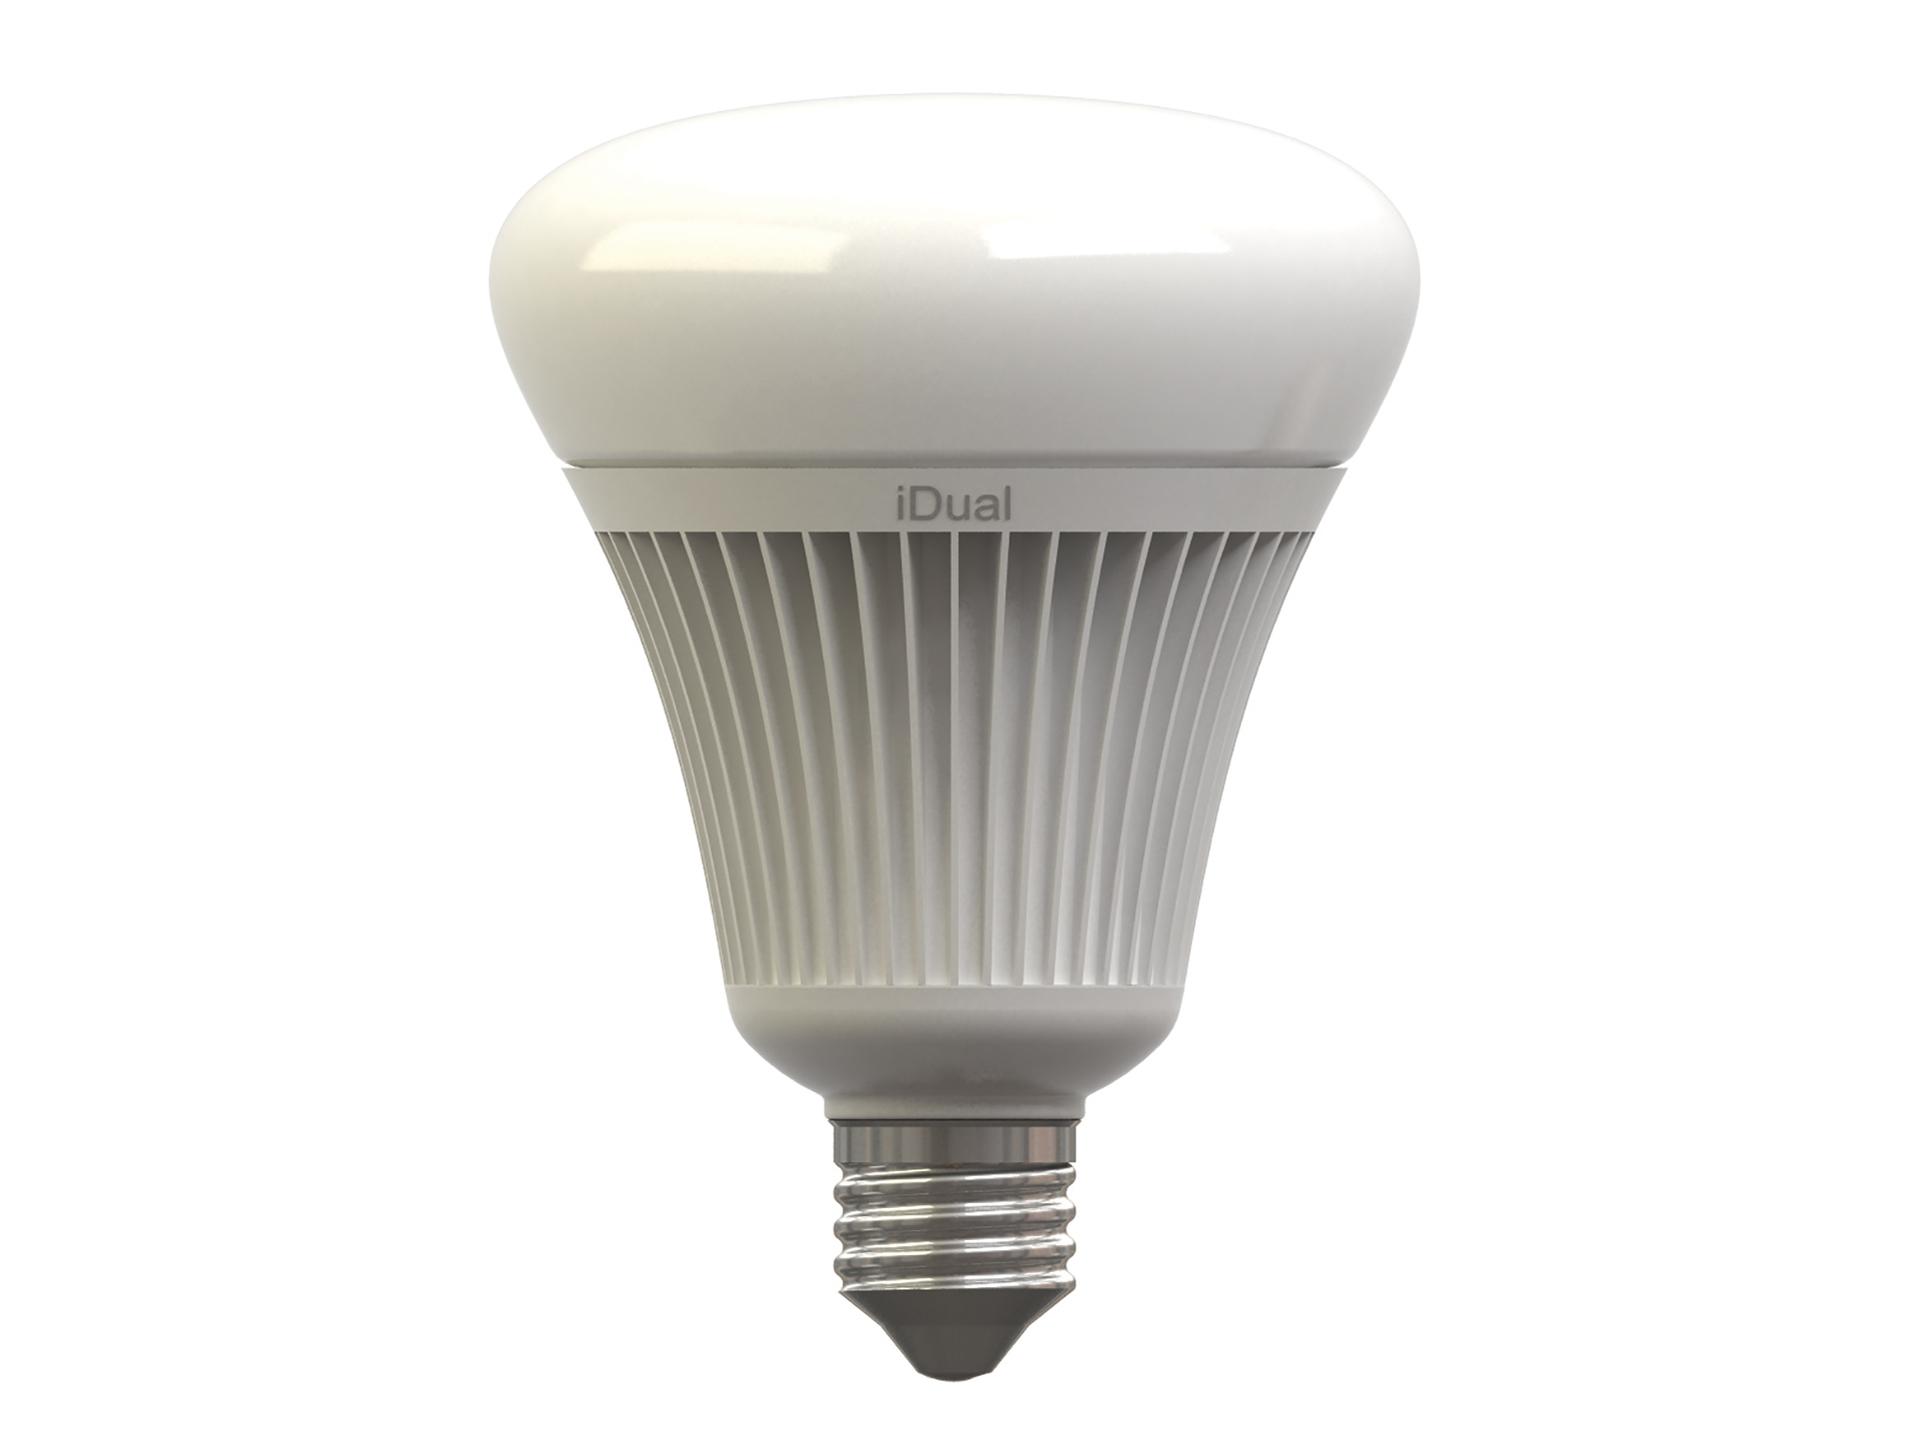 Lampen Op Afstandsbediening : Jedi idual g100 led lamp e27 16w afstandsbediening hubo